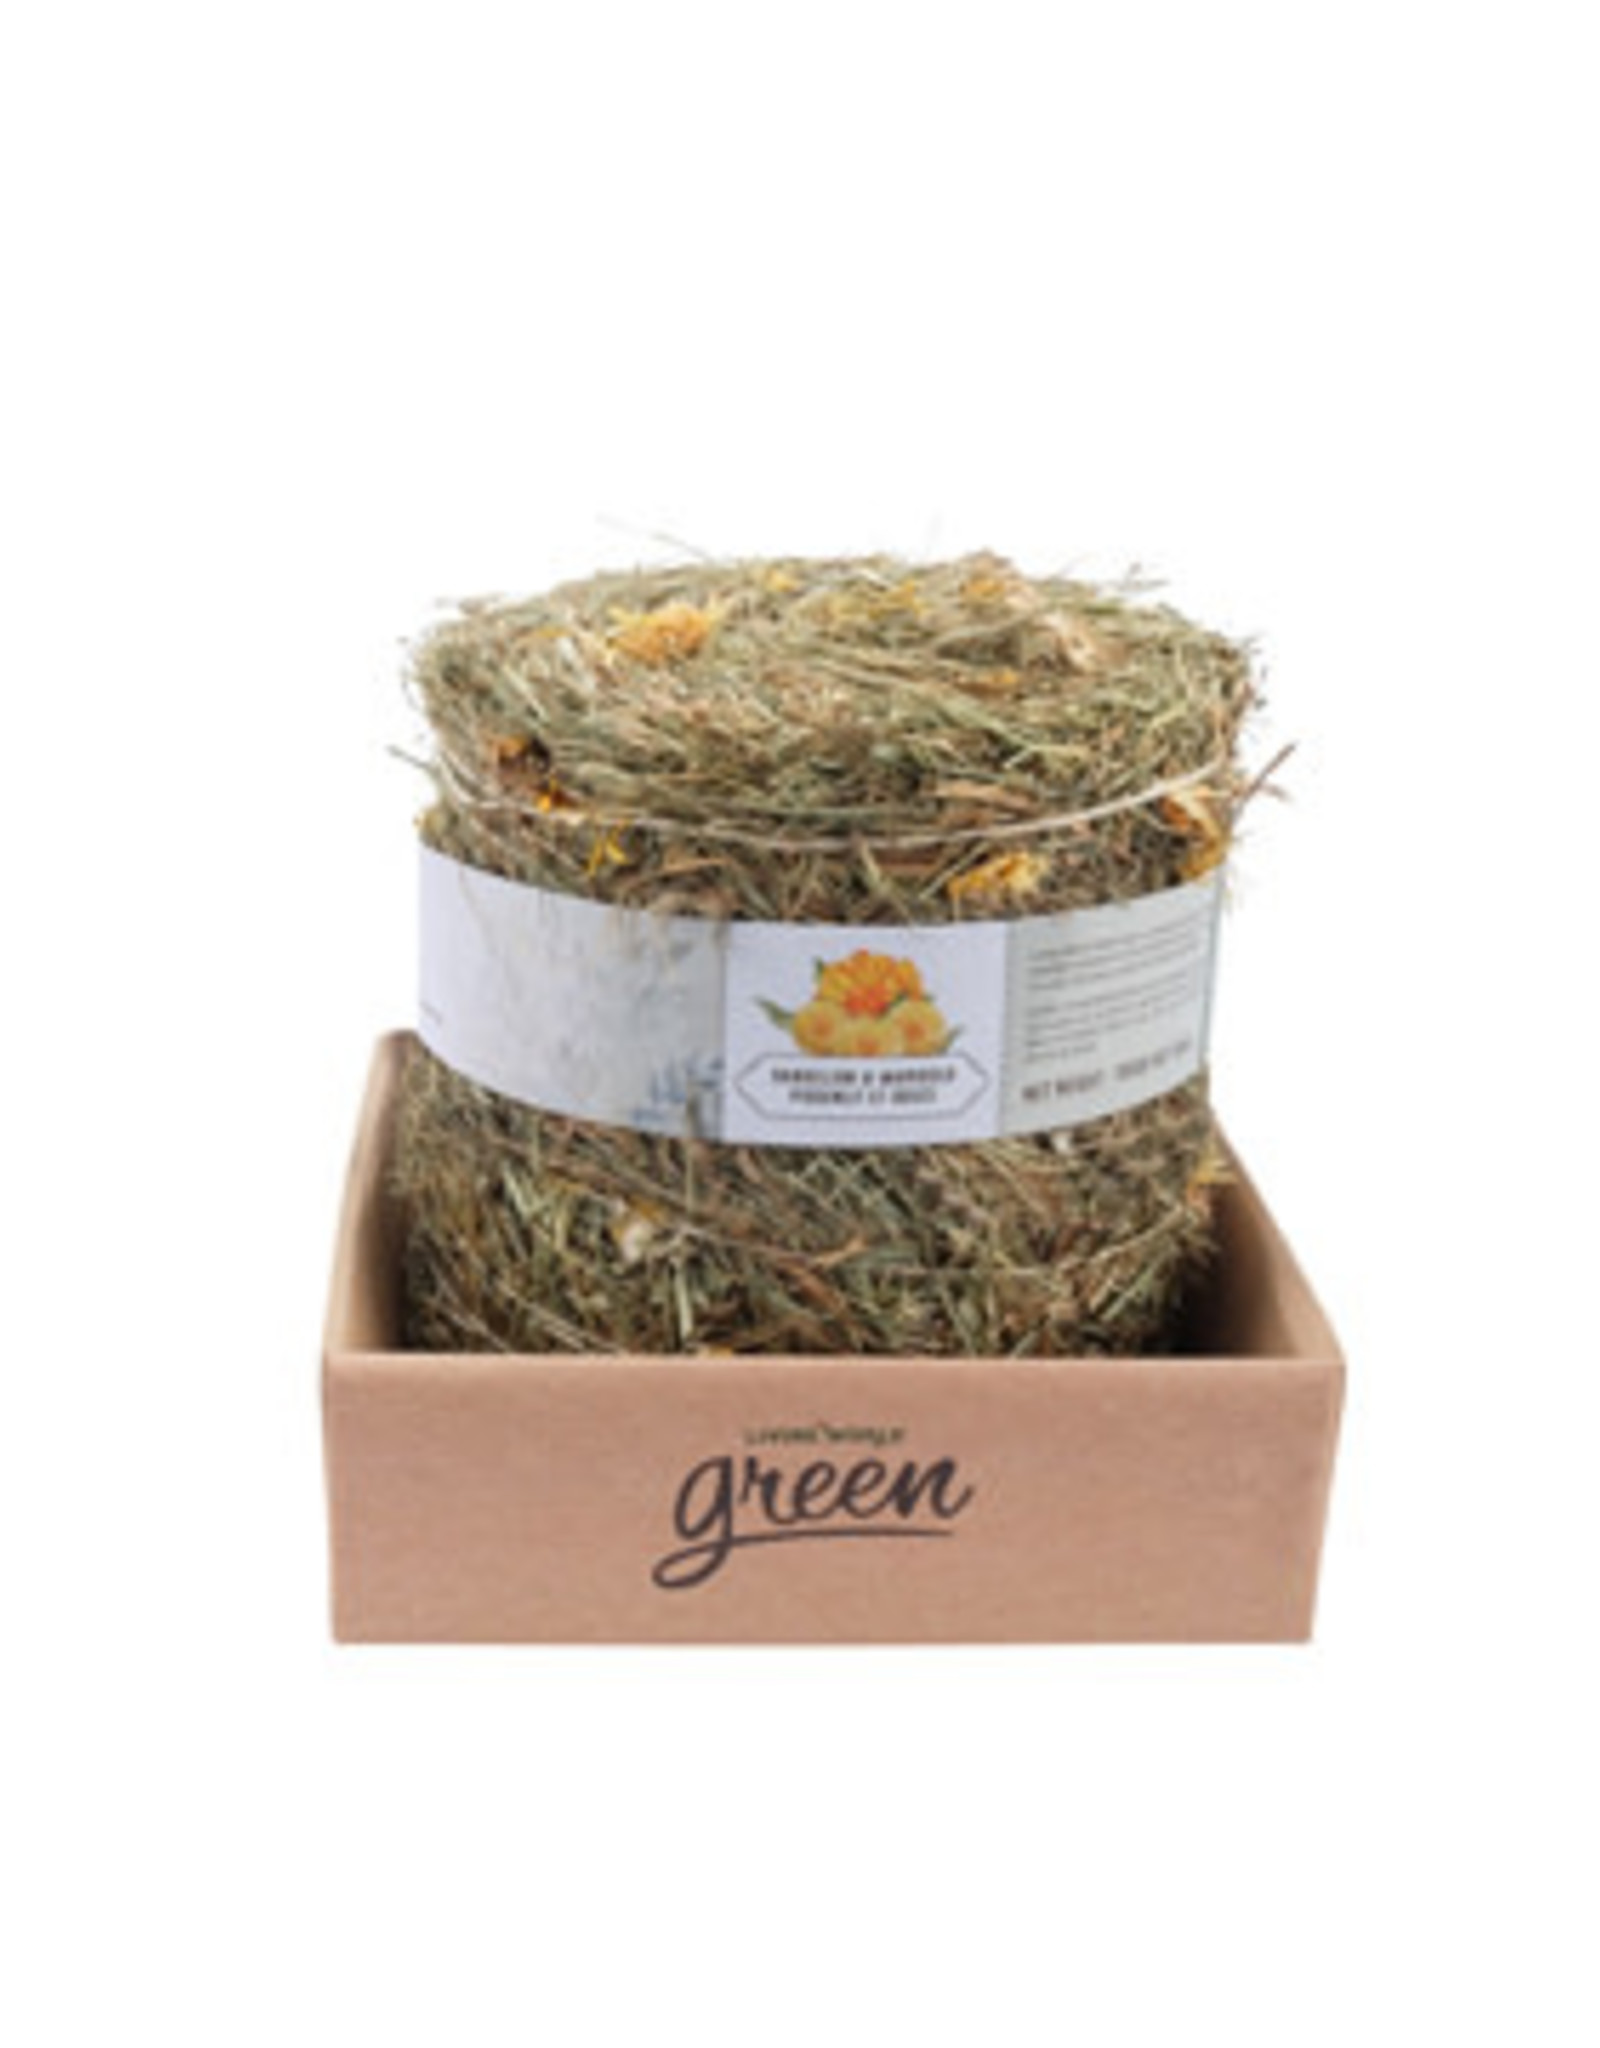 LIVING WORLD Living World Green Botanicals Meadow Hay Bale - Dandelion & Marigold - 500 g